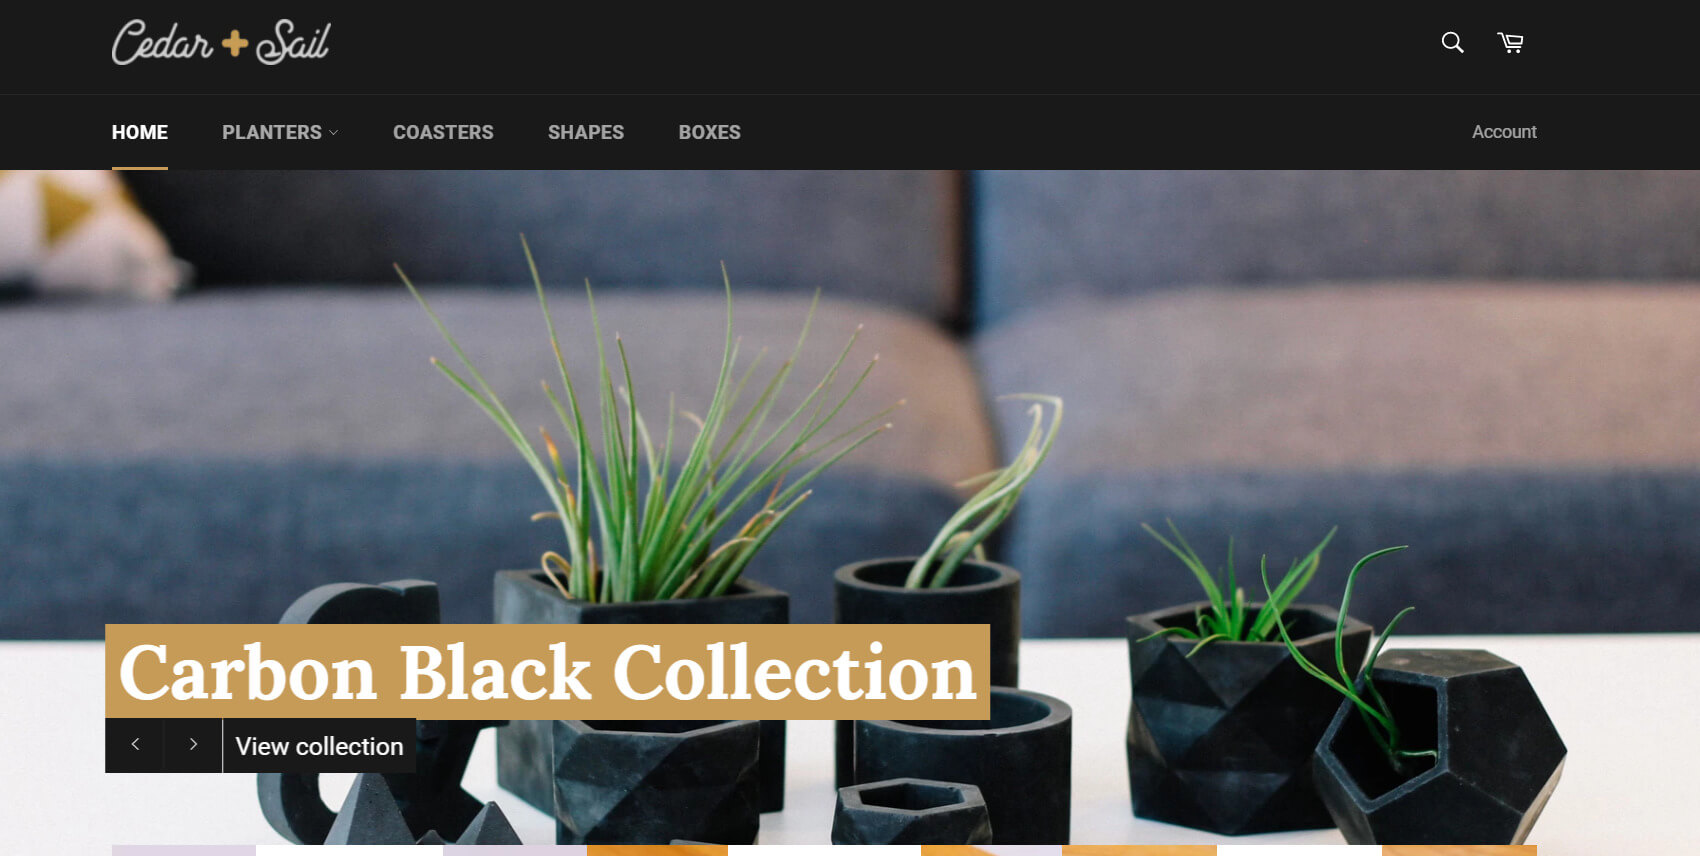 cedar + saul cabon black collection